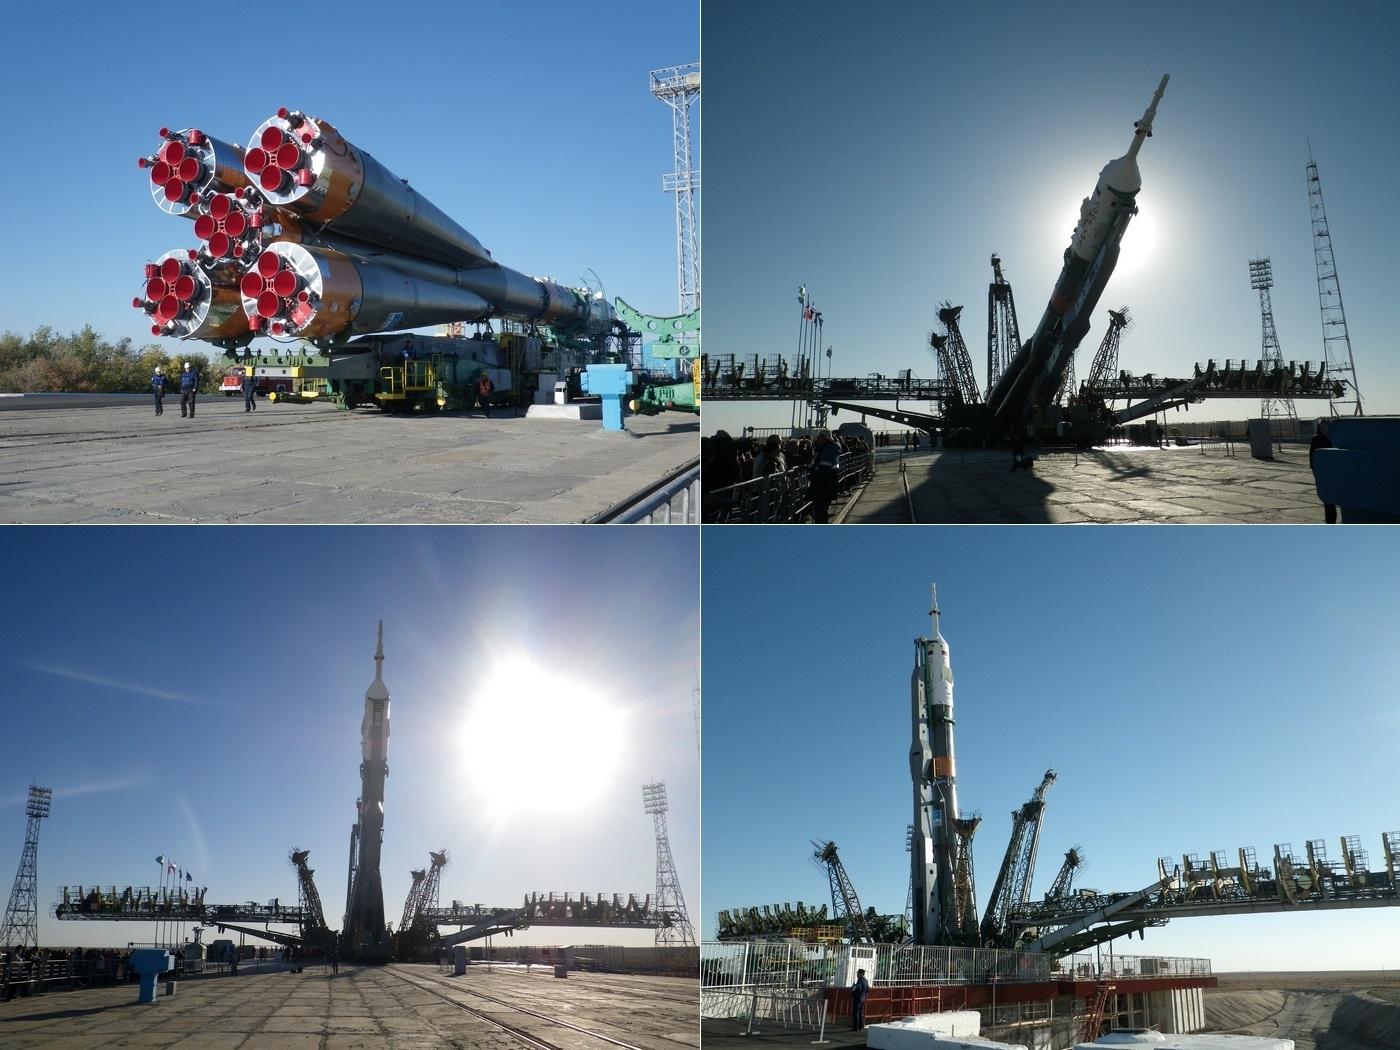 Ракете-носителю «Союз» исполнилось 50 лет - 3